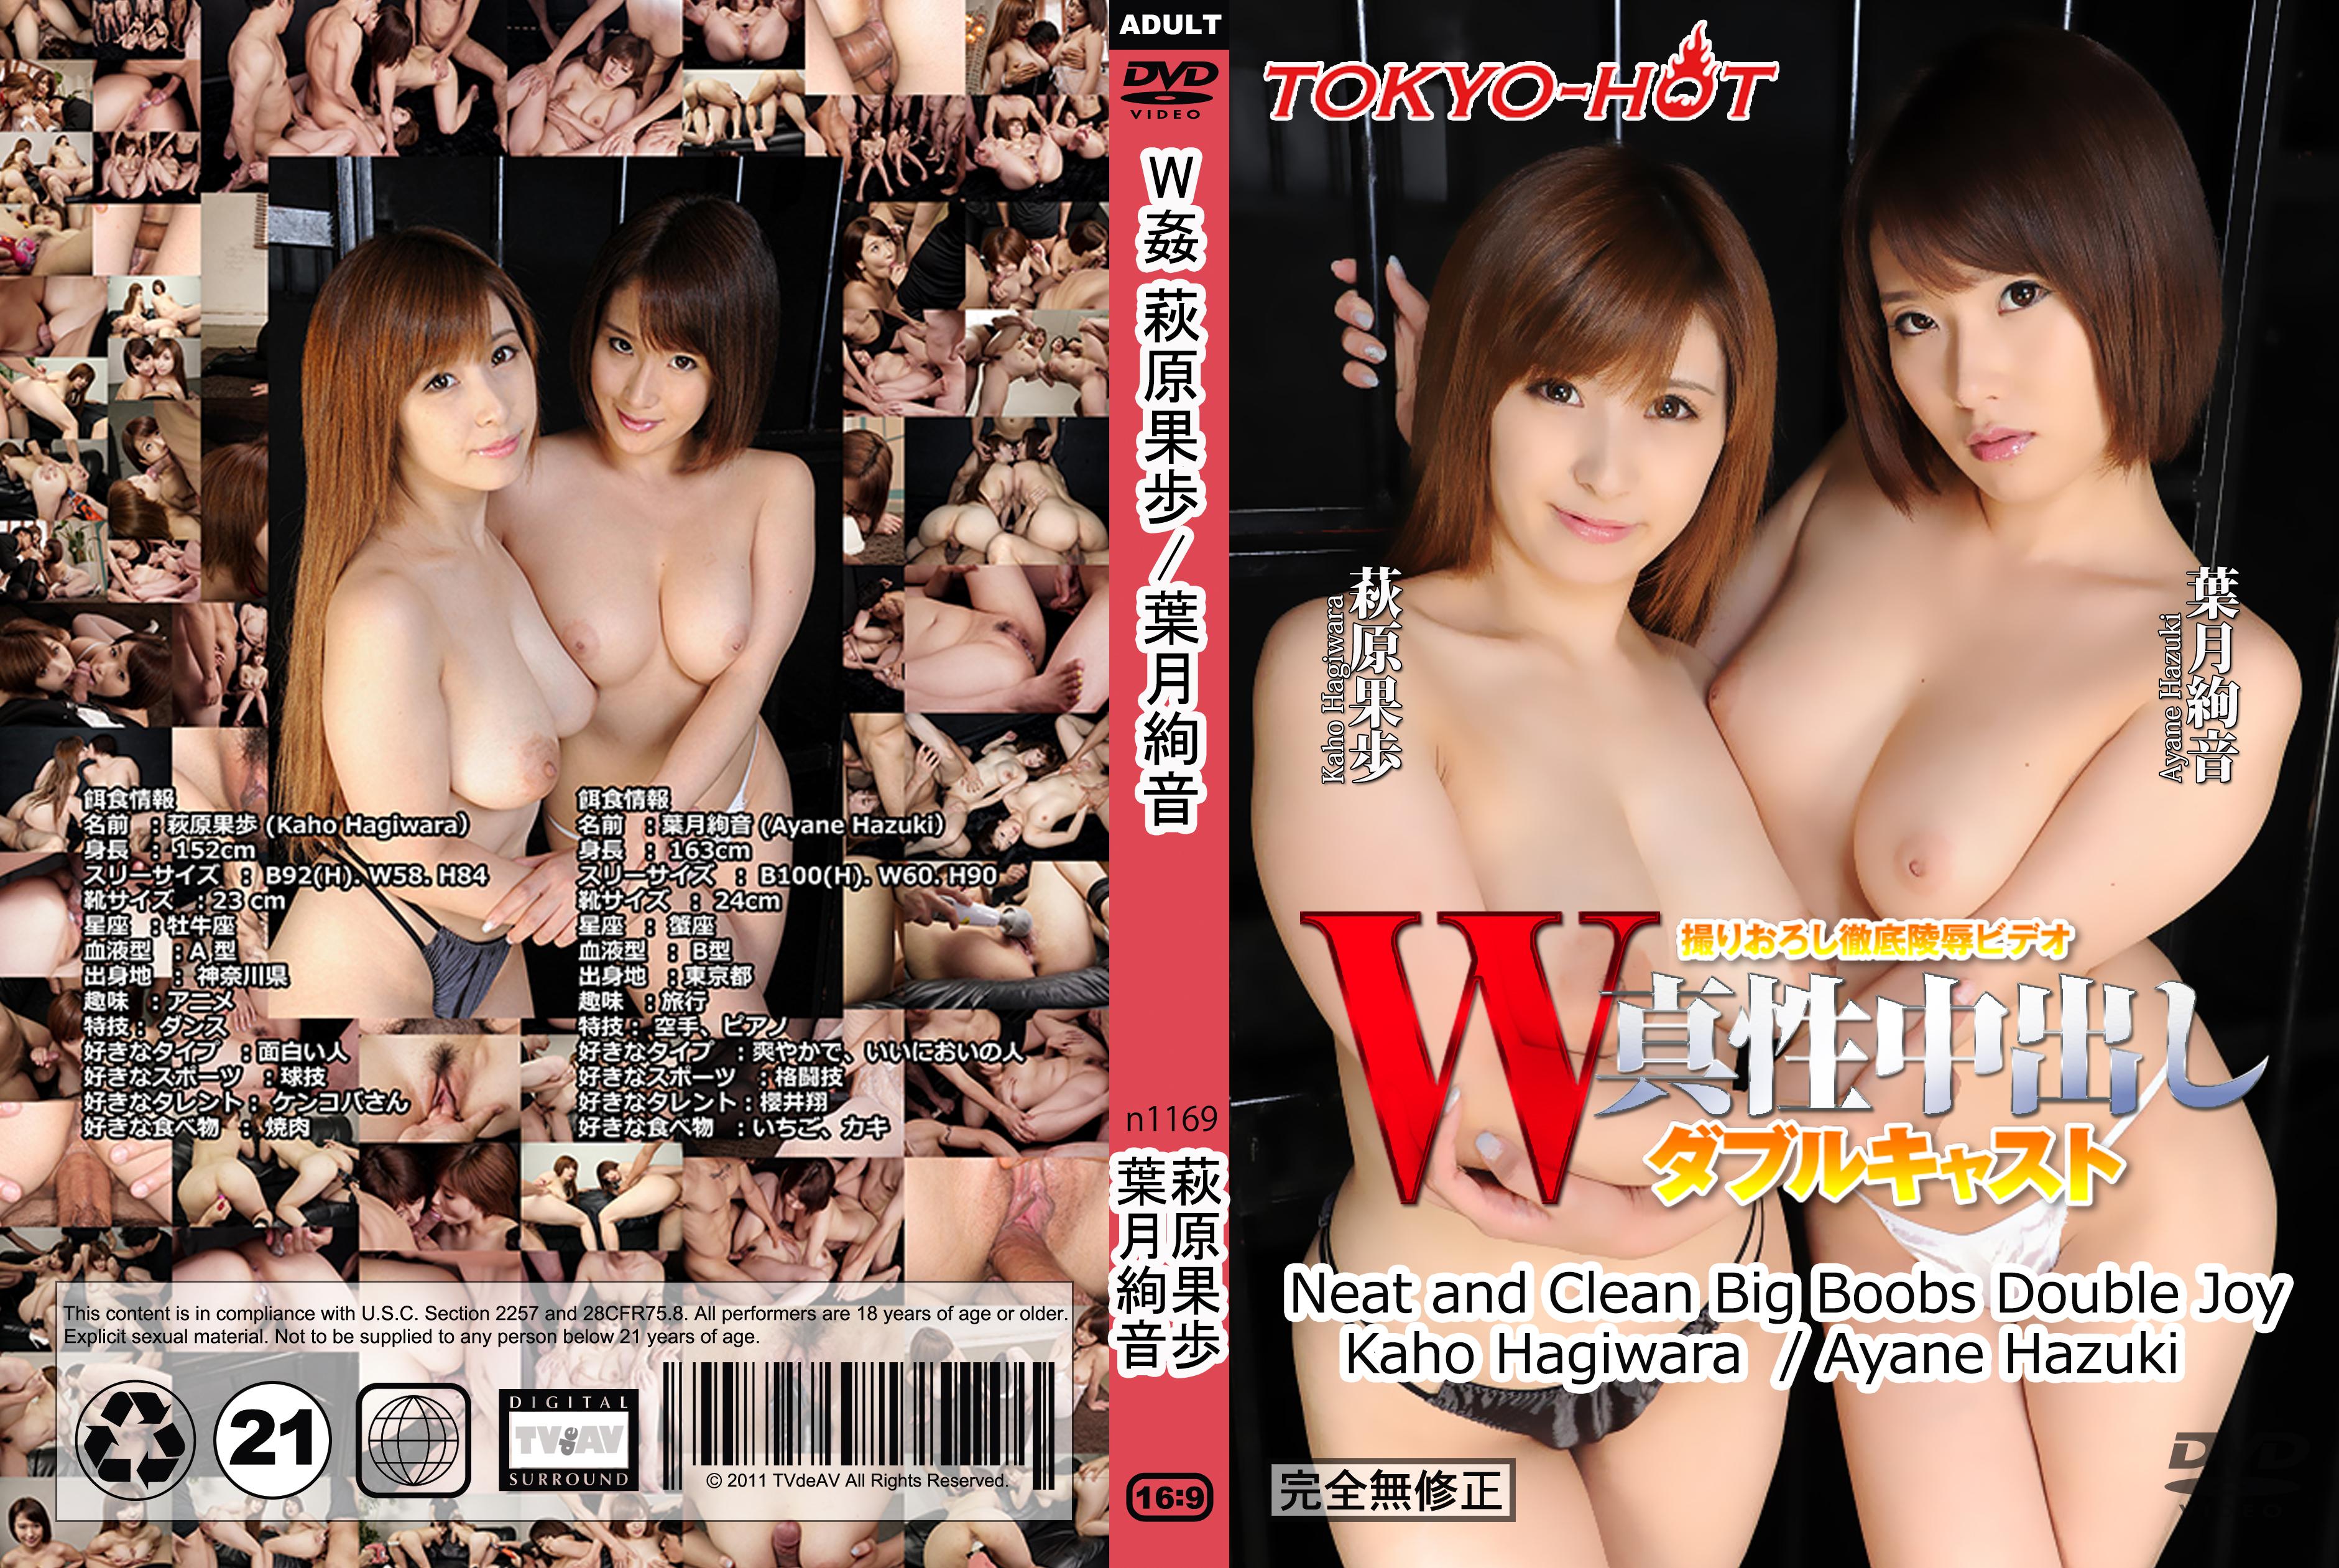 Neat and Clean Big Boobs Double Joy Kaho Hagiwara and Ayane Hazuki